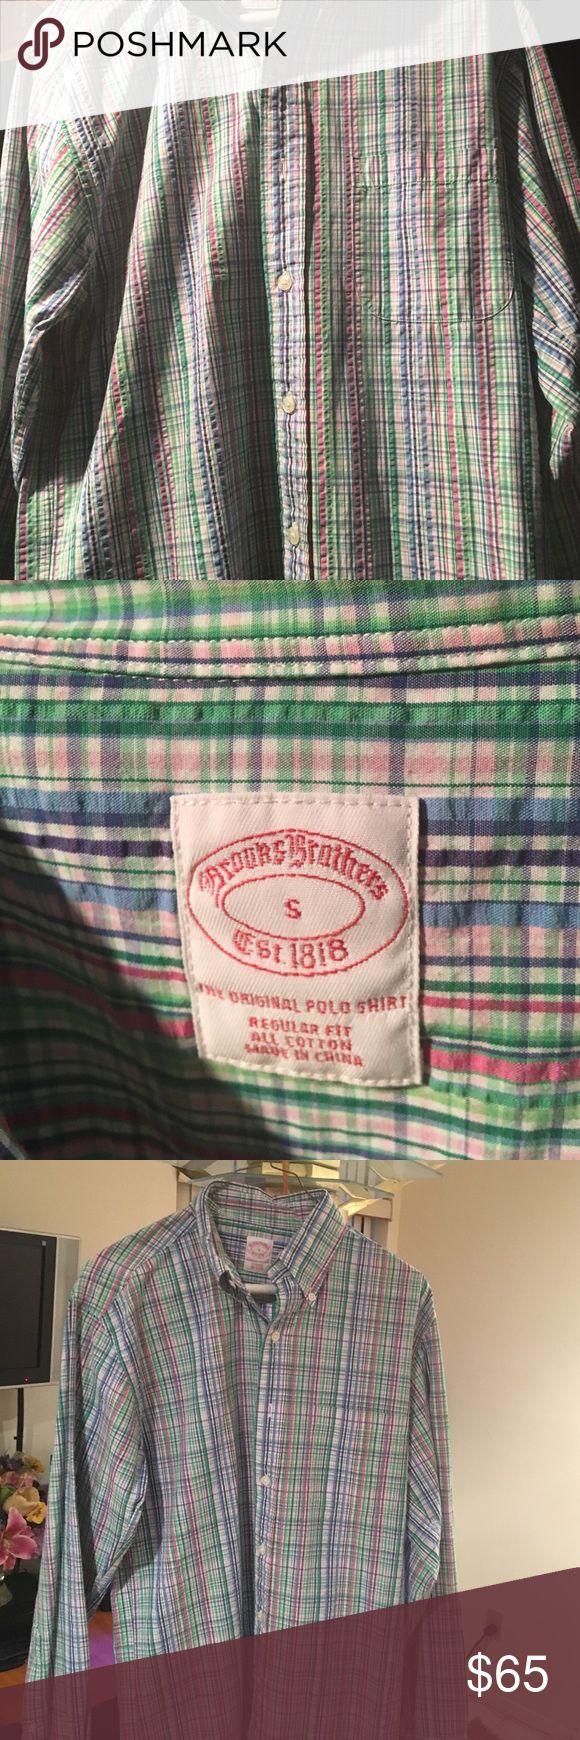 Brooks Brothers Men's Shirt Brooks Brothers Men's button down casual shirt Brooks Brothers Shirts Casual Button Down Shirts